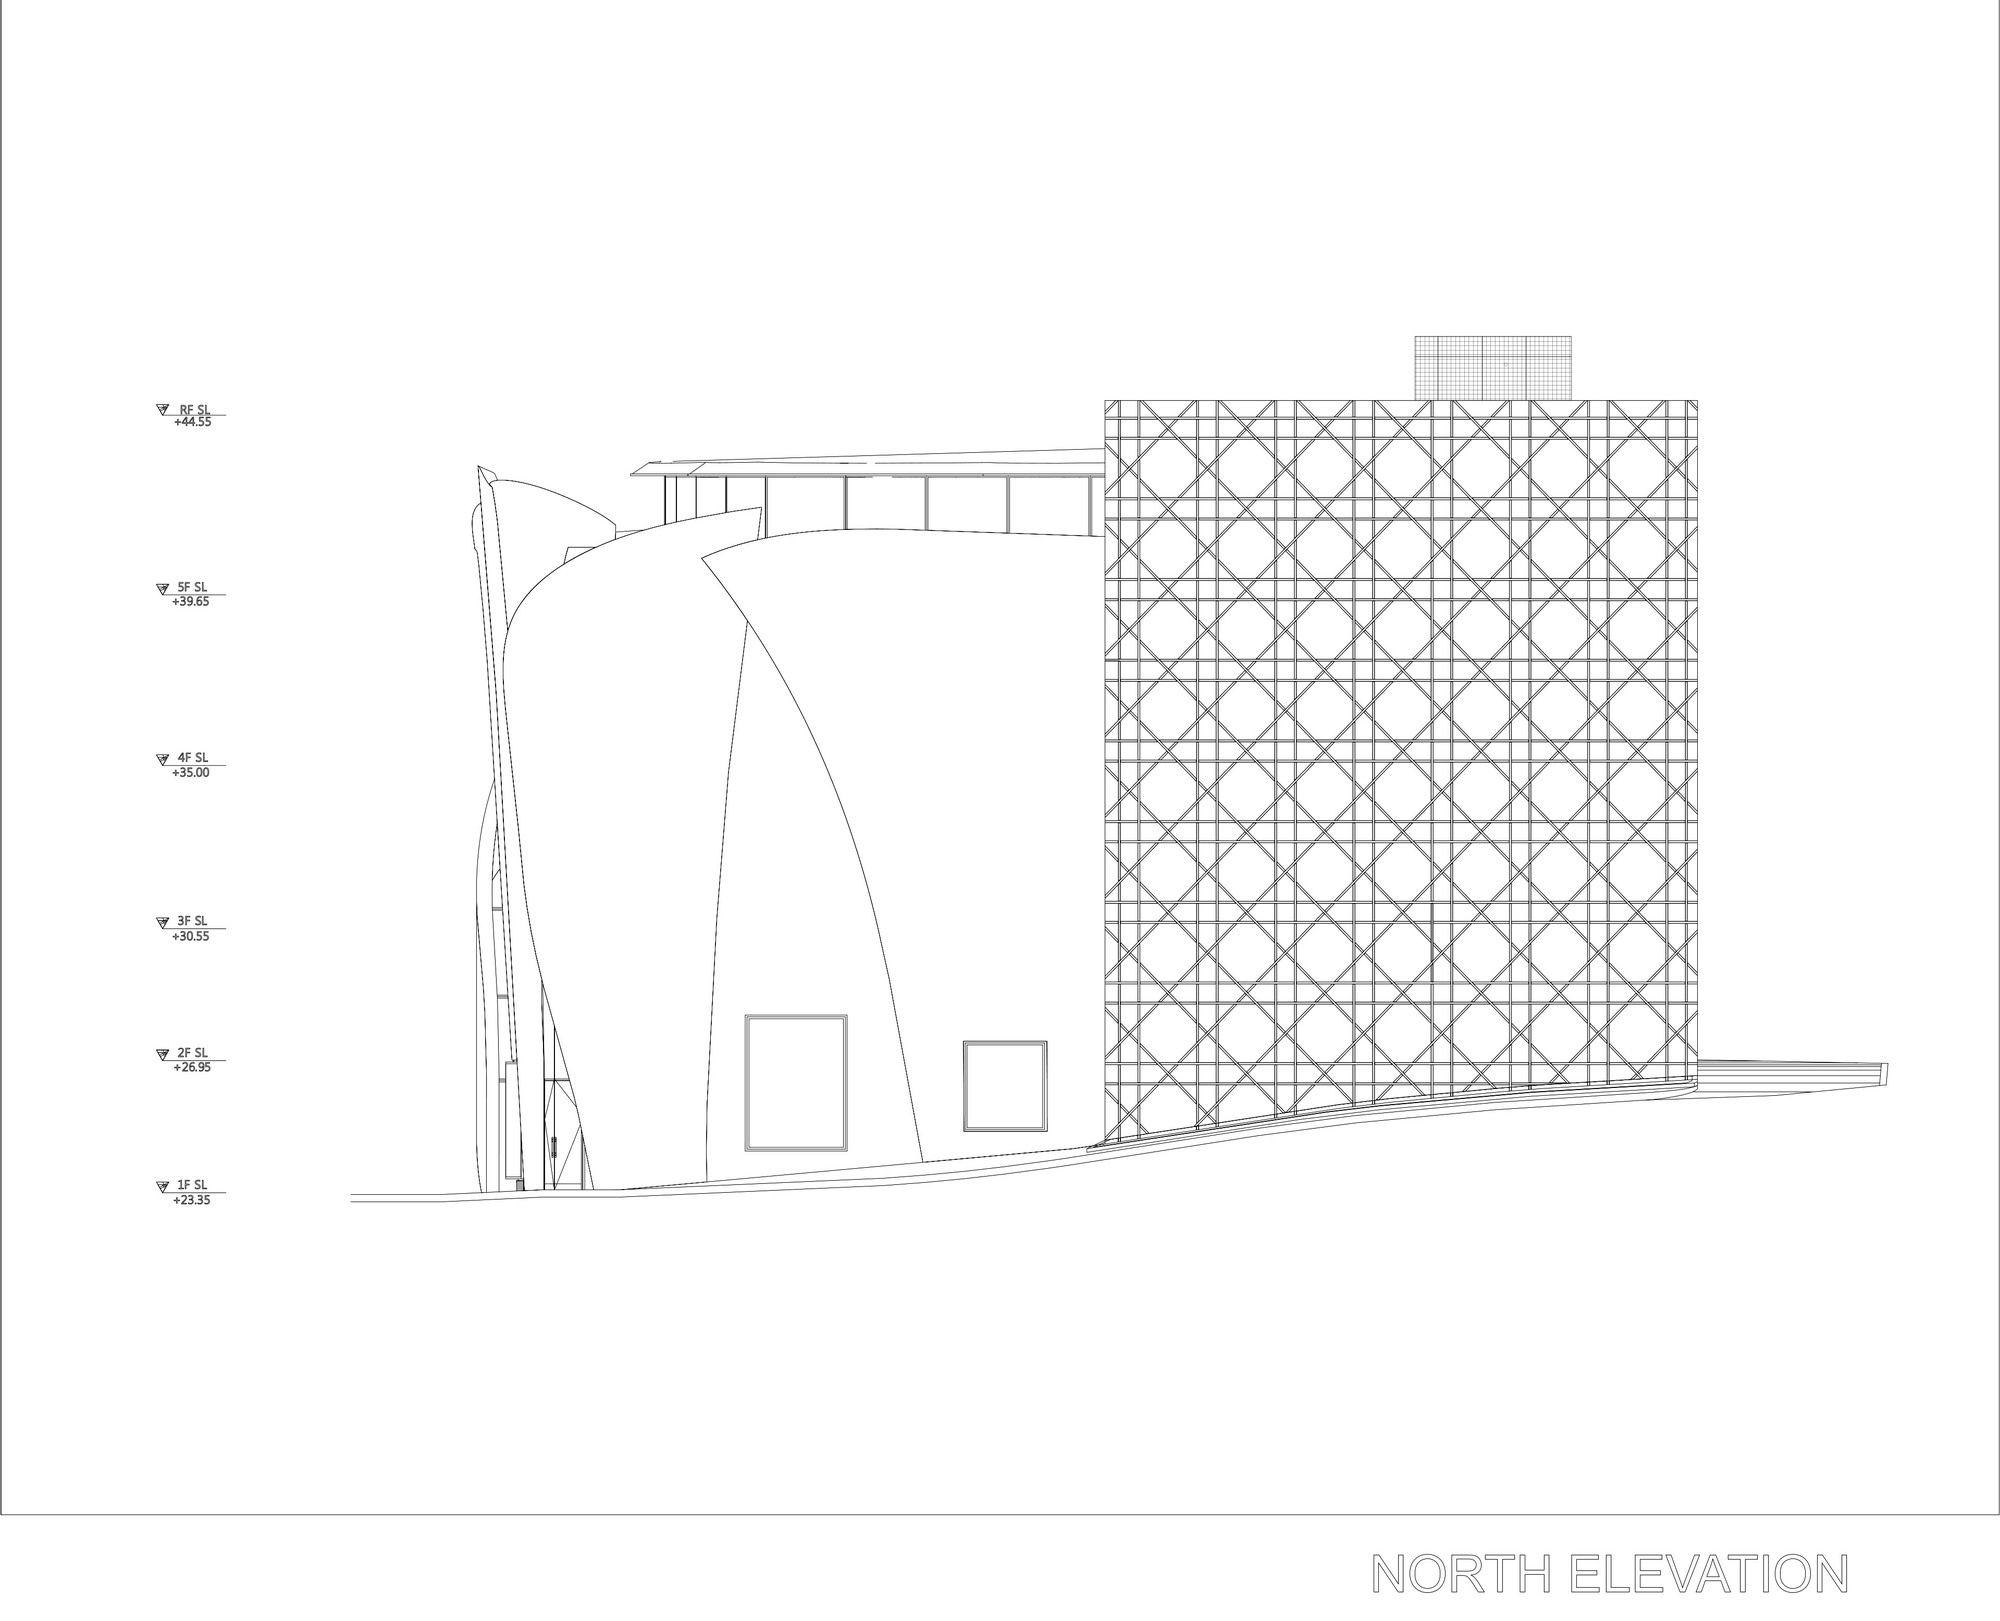 Image 39 of 53. Elevation